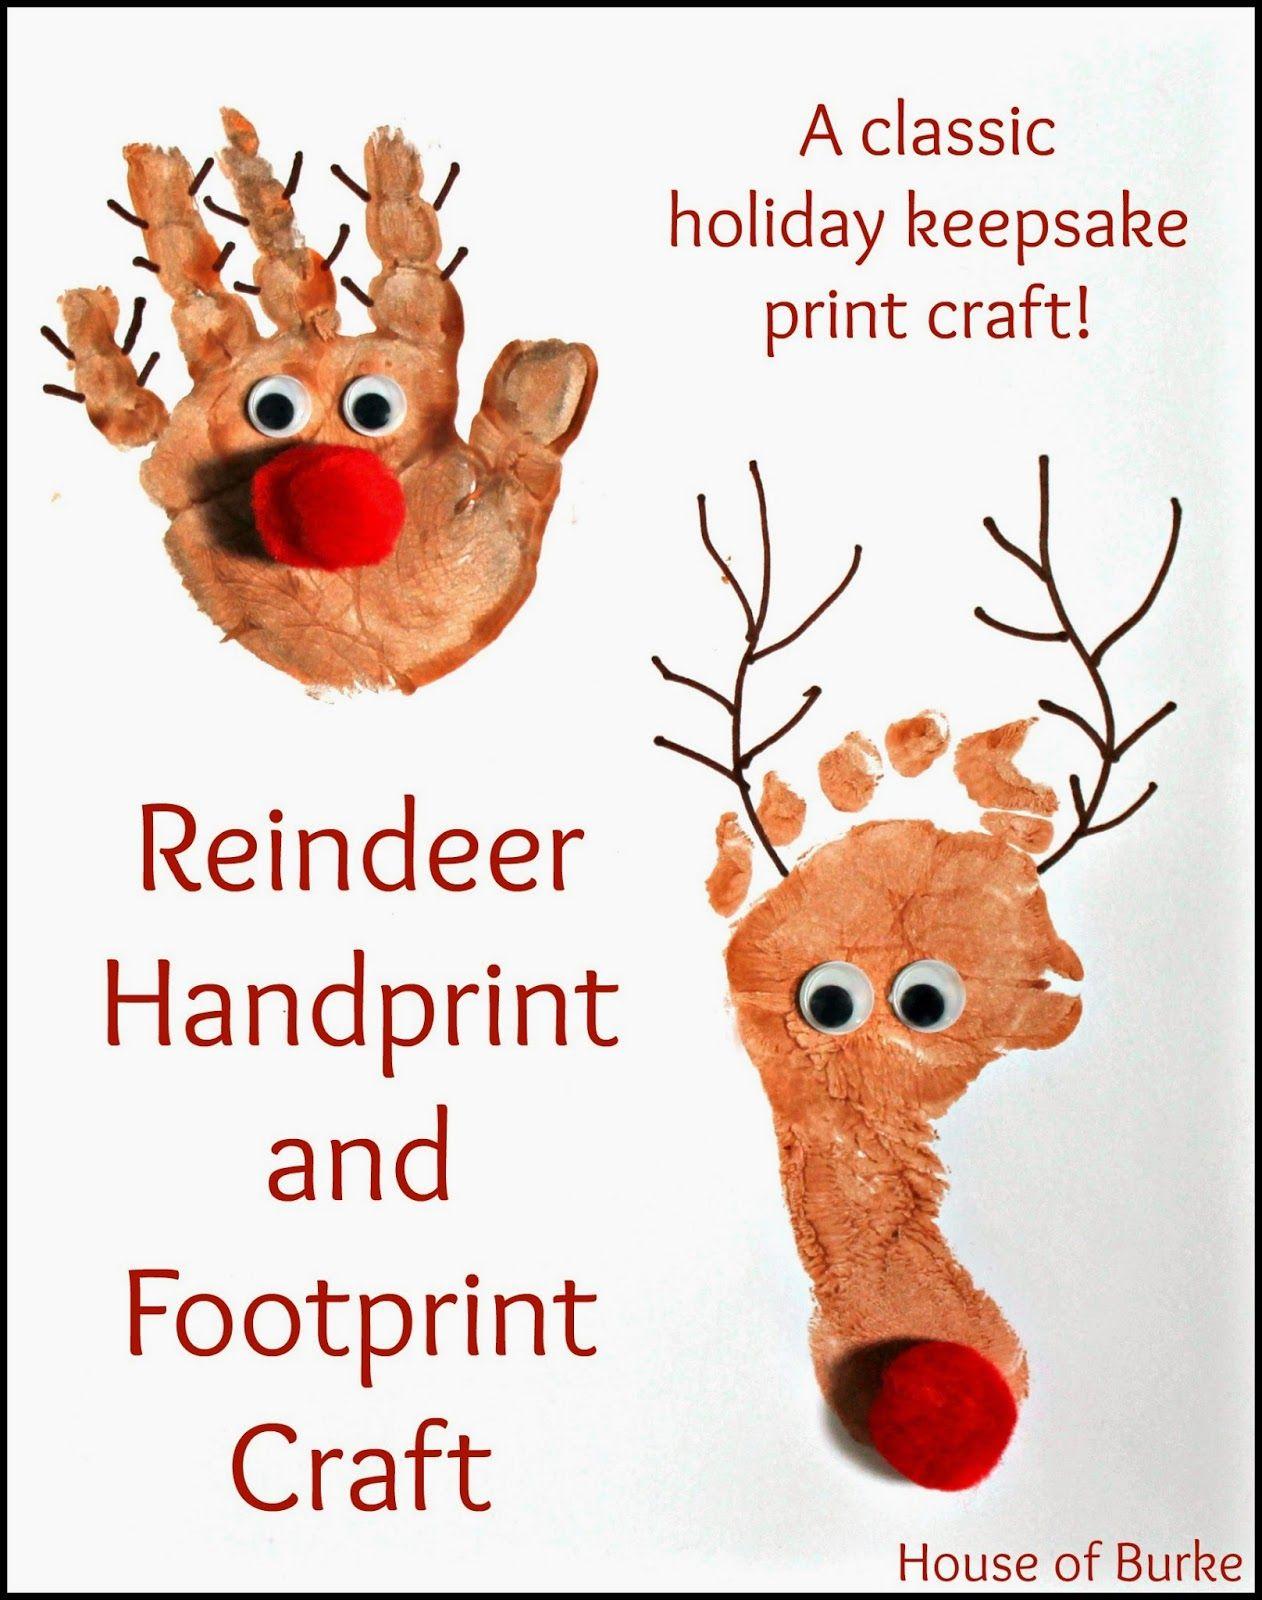 Reindeer Handprint and Footprint Craft Reindeer